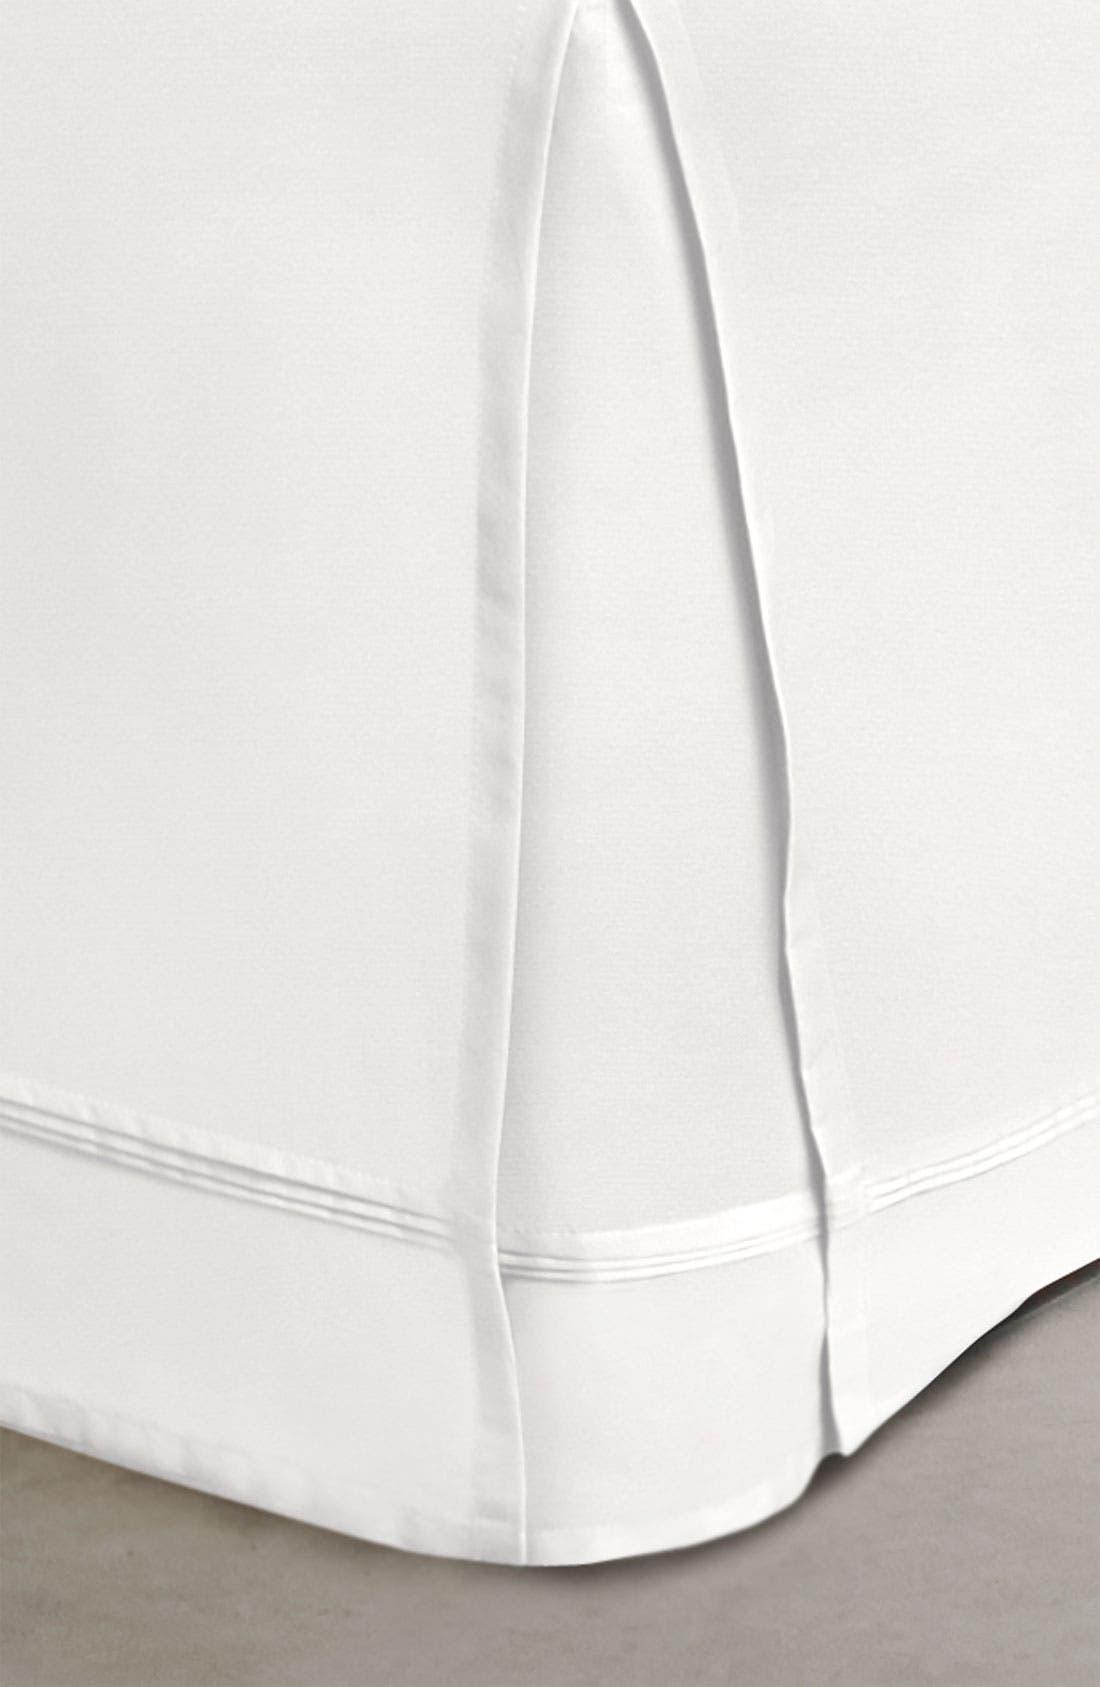 Main Image - Donna Karan 'Lustre Seam' Bed Skirt